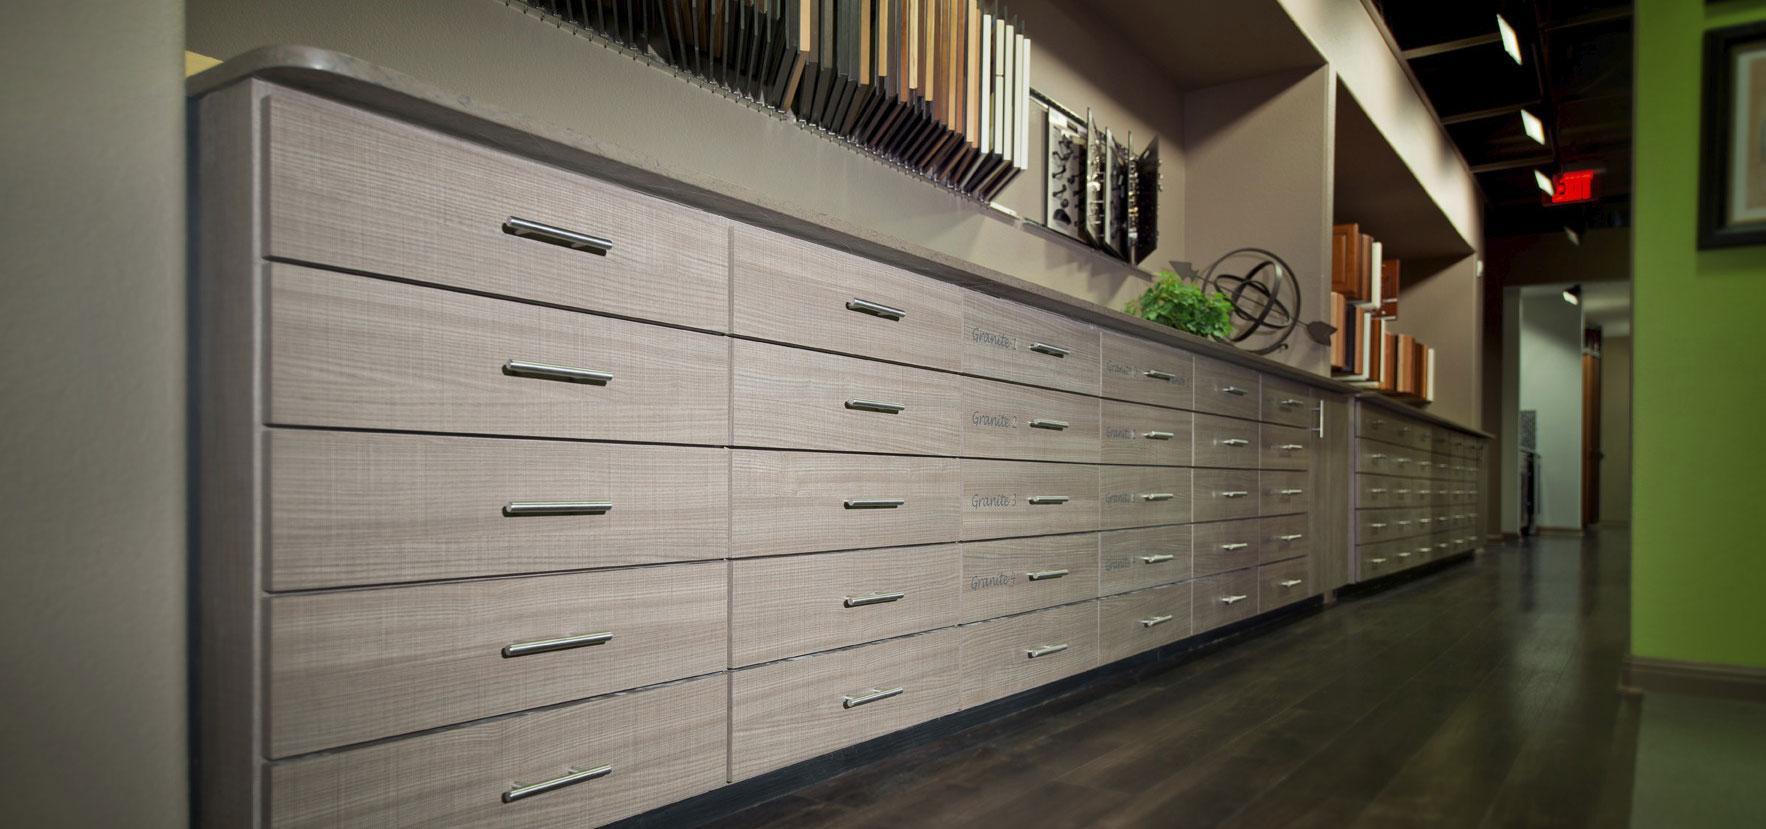 DR Horton Design Center Cabinets